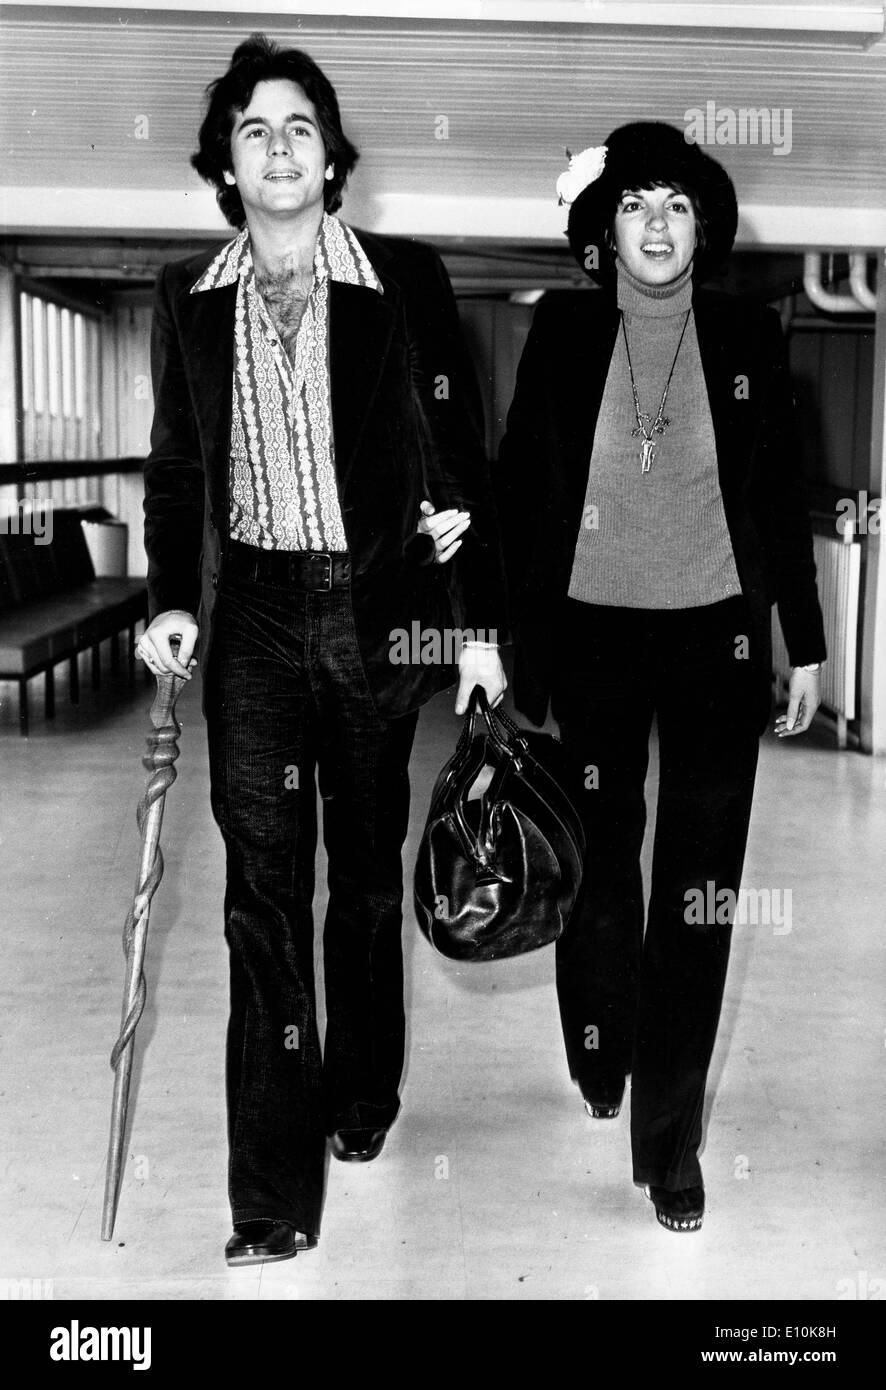 Singer Liza Minnelli Travels With Desi Arnaz Jr Stock Photo, Royalty ...